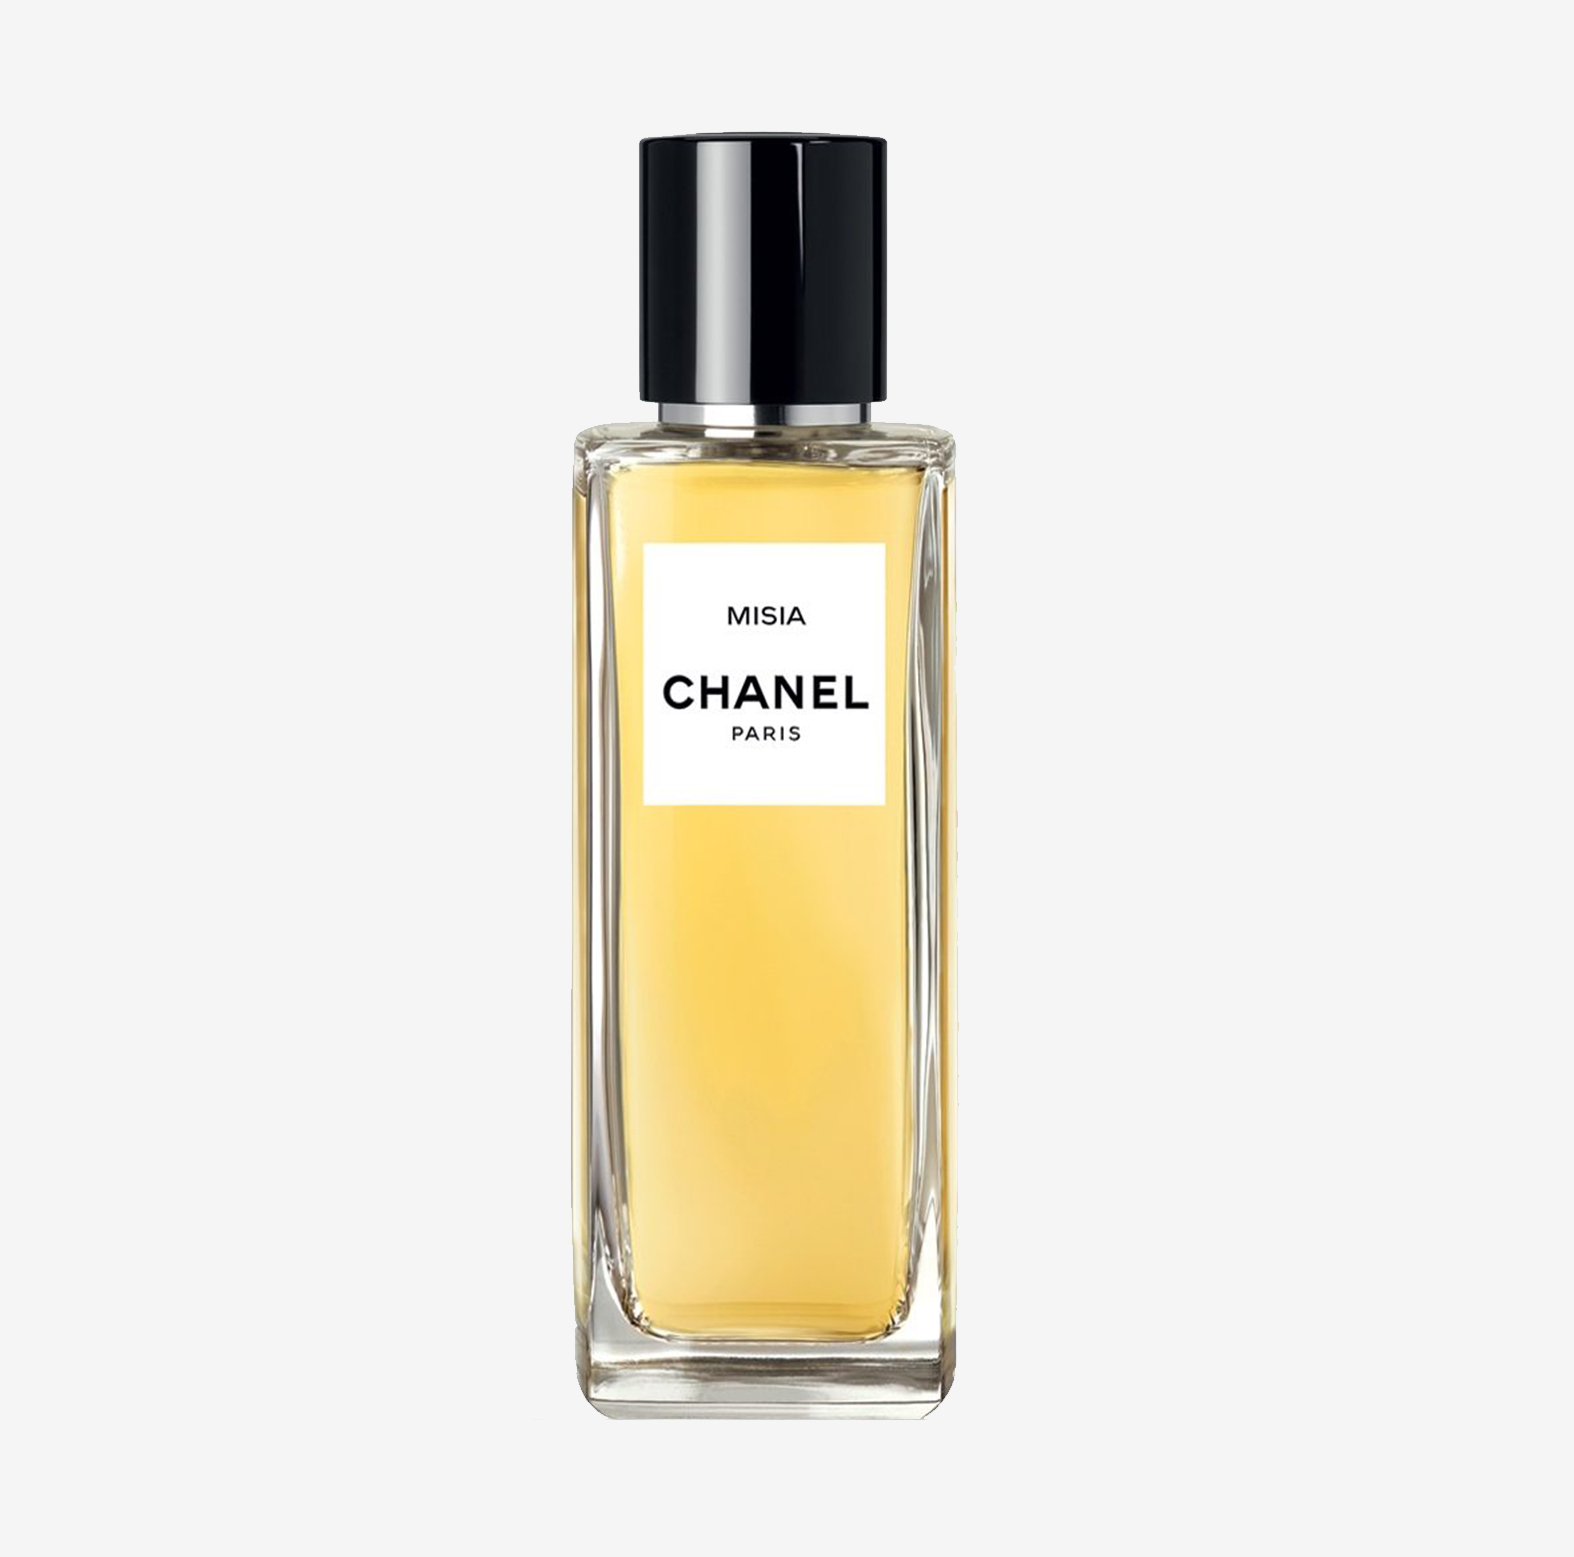 Misia Chanel, Chanel